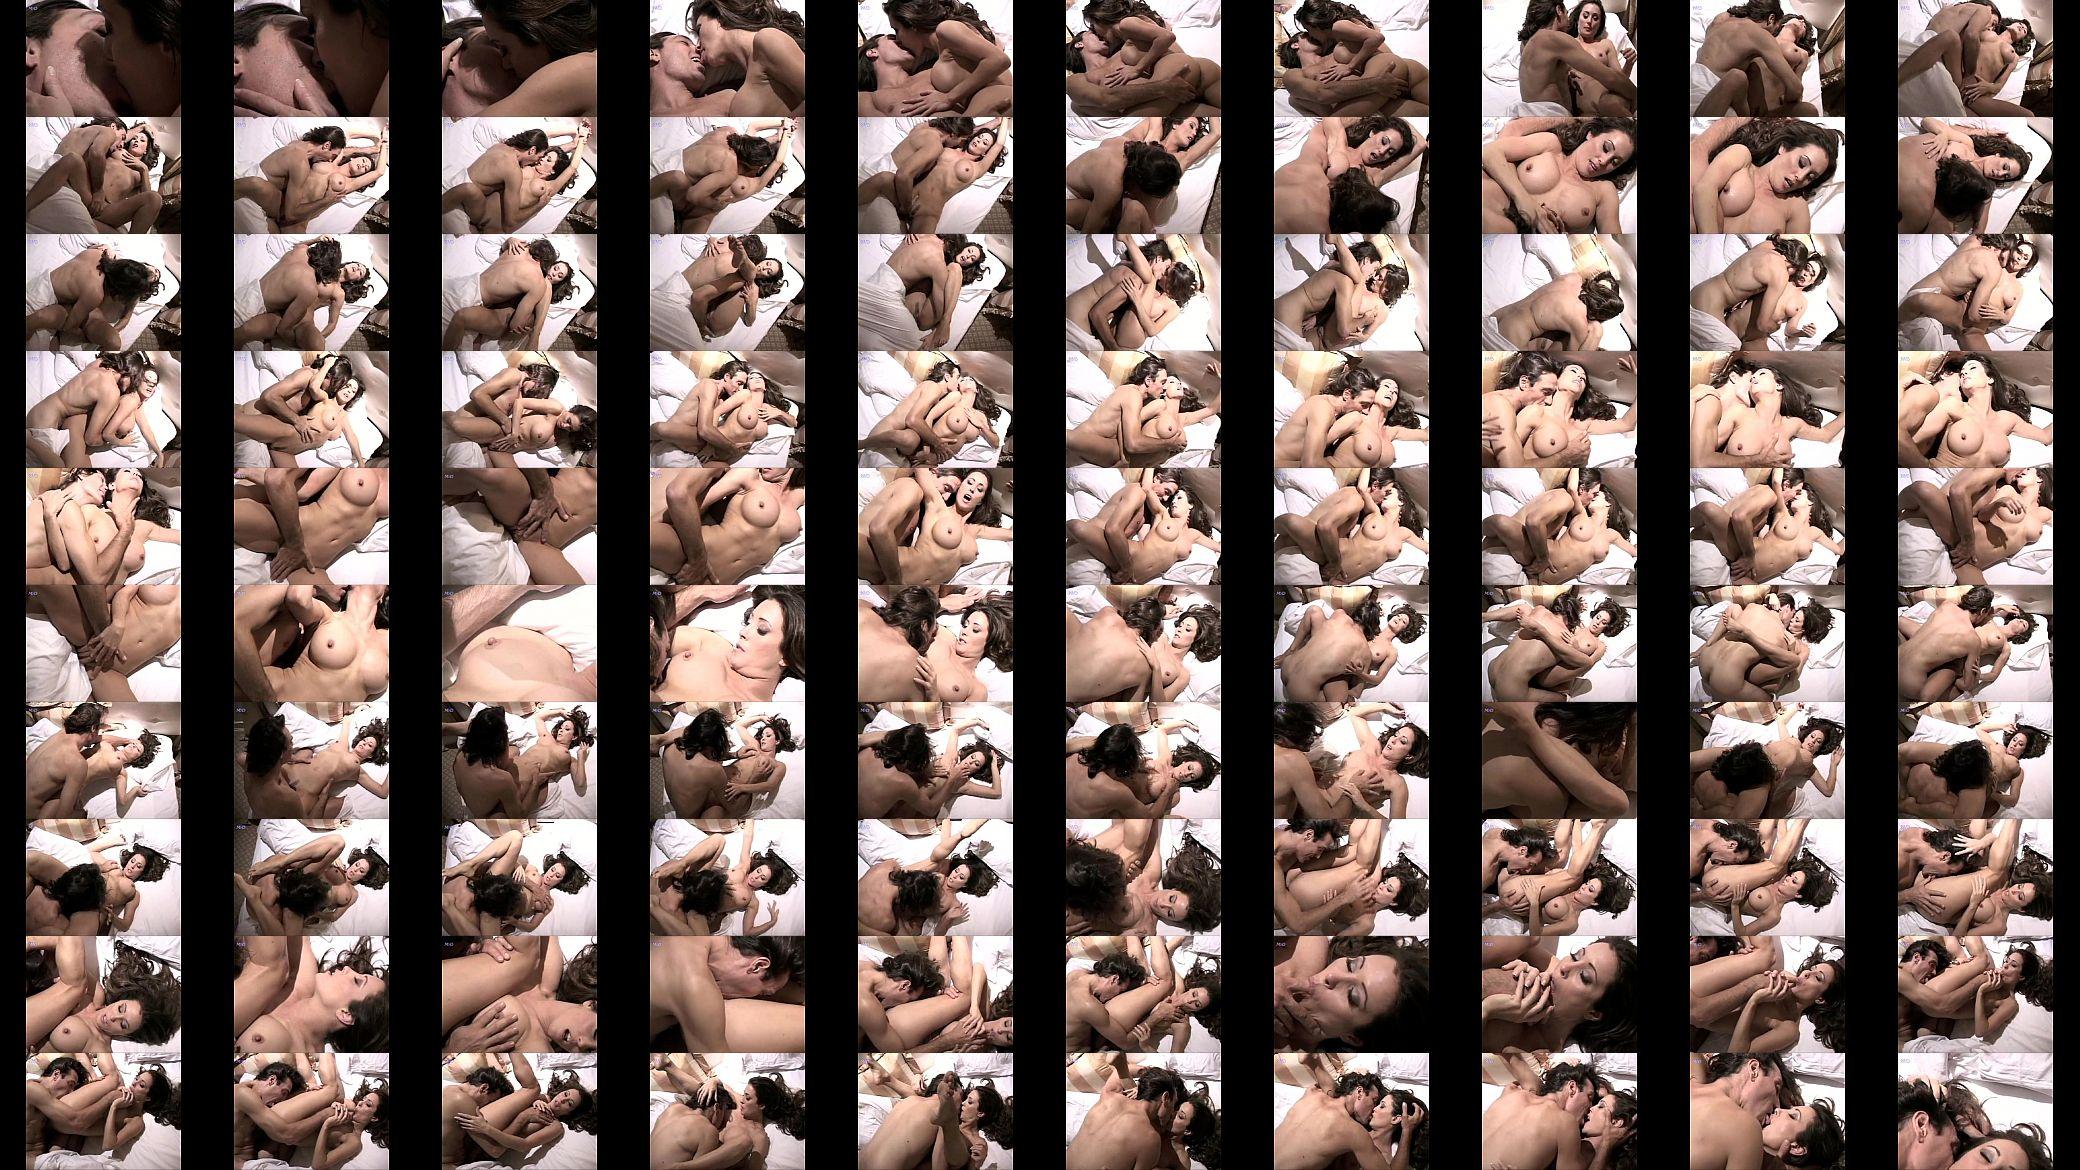 Teen girls naked webcam feet